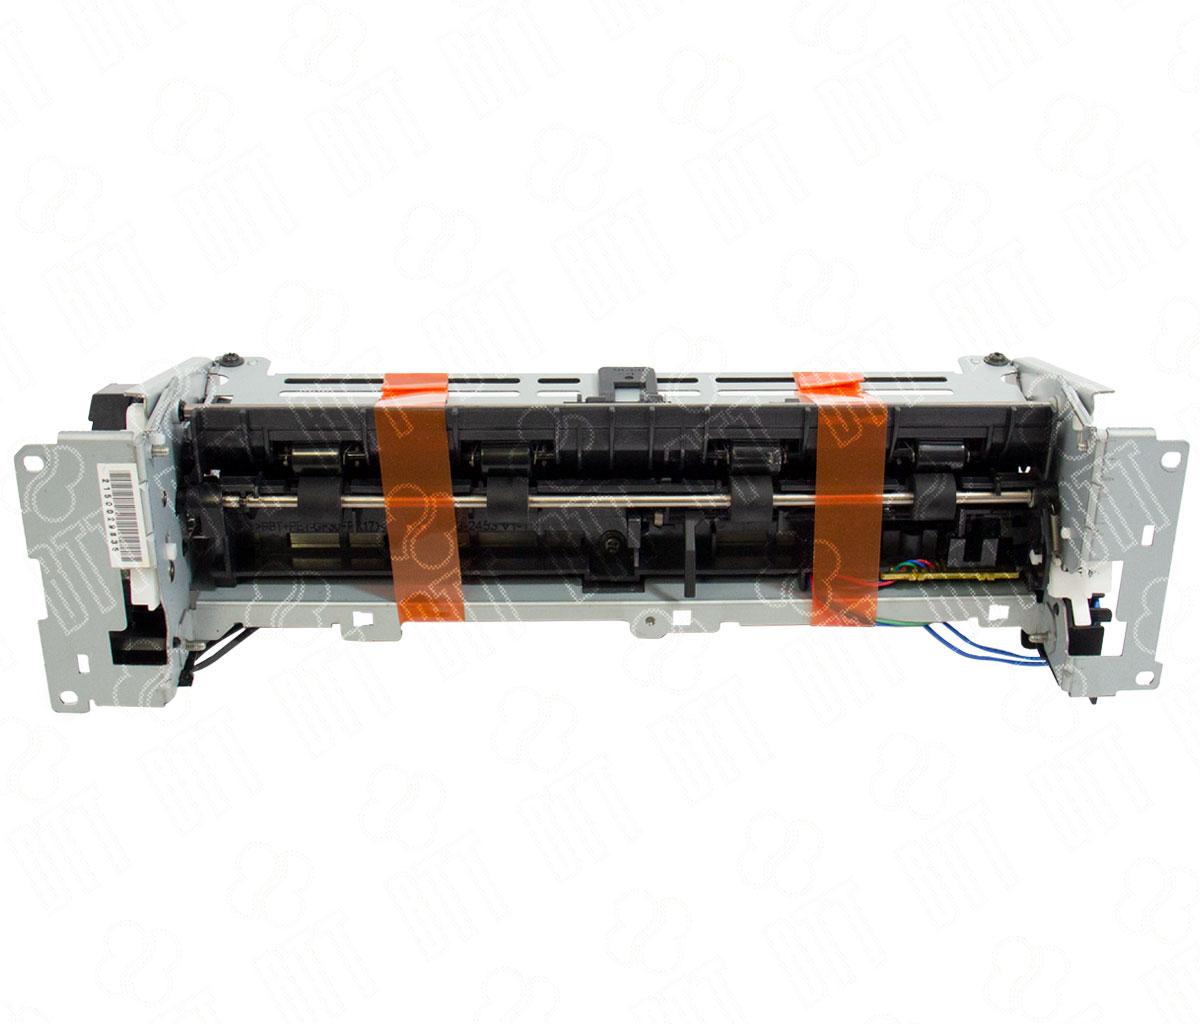 Термоузел (Печь) в сборе совм. для HP LJ Pro 400 M401/M425 (Apex) восст.